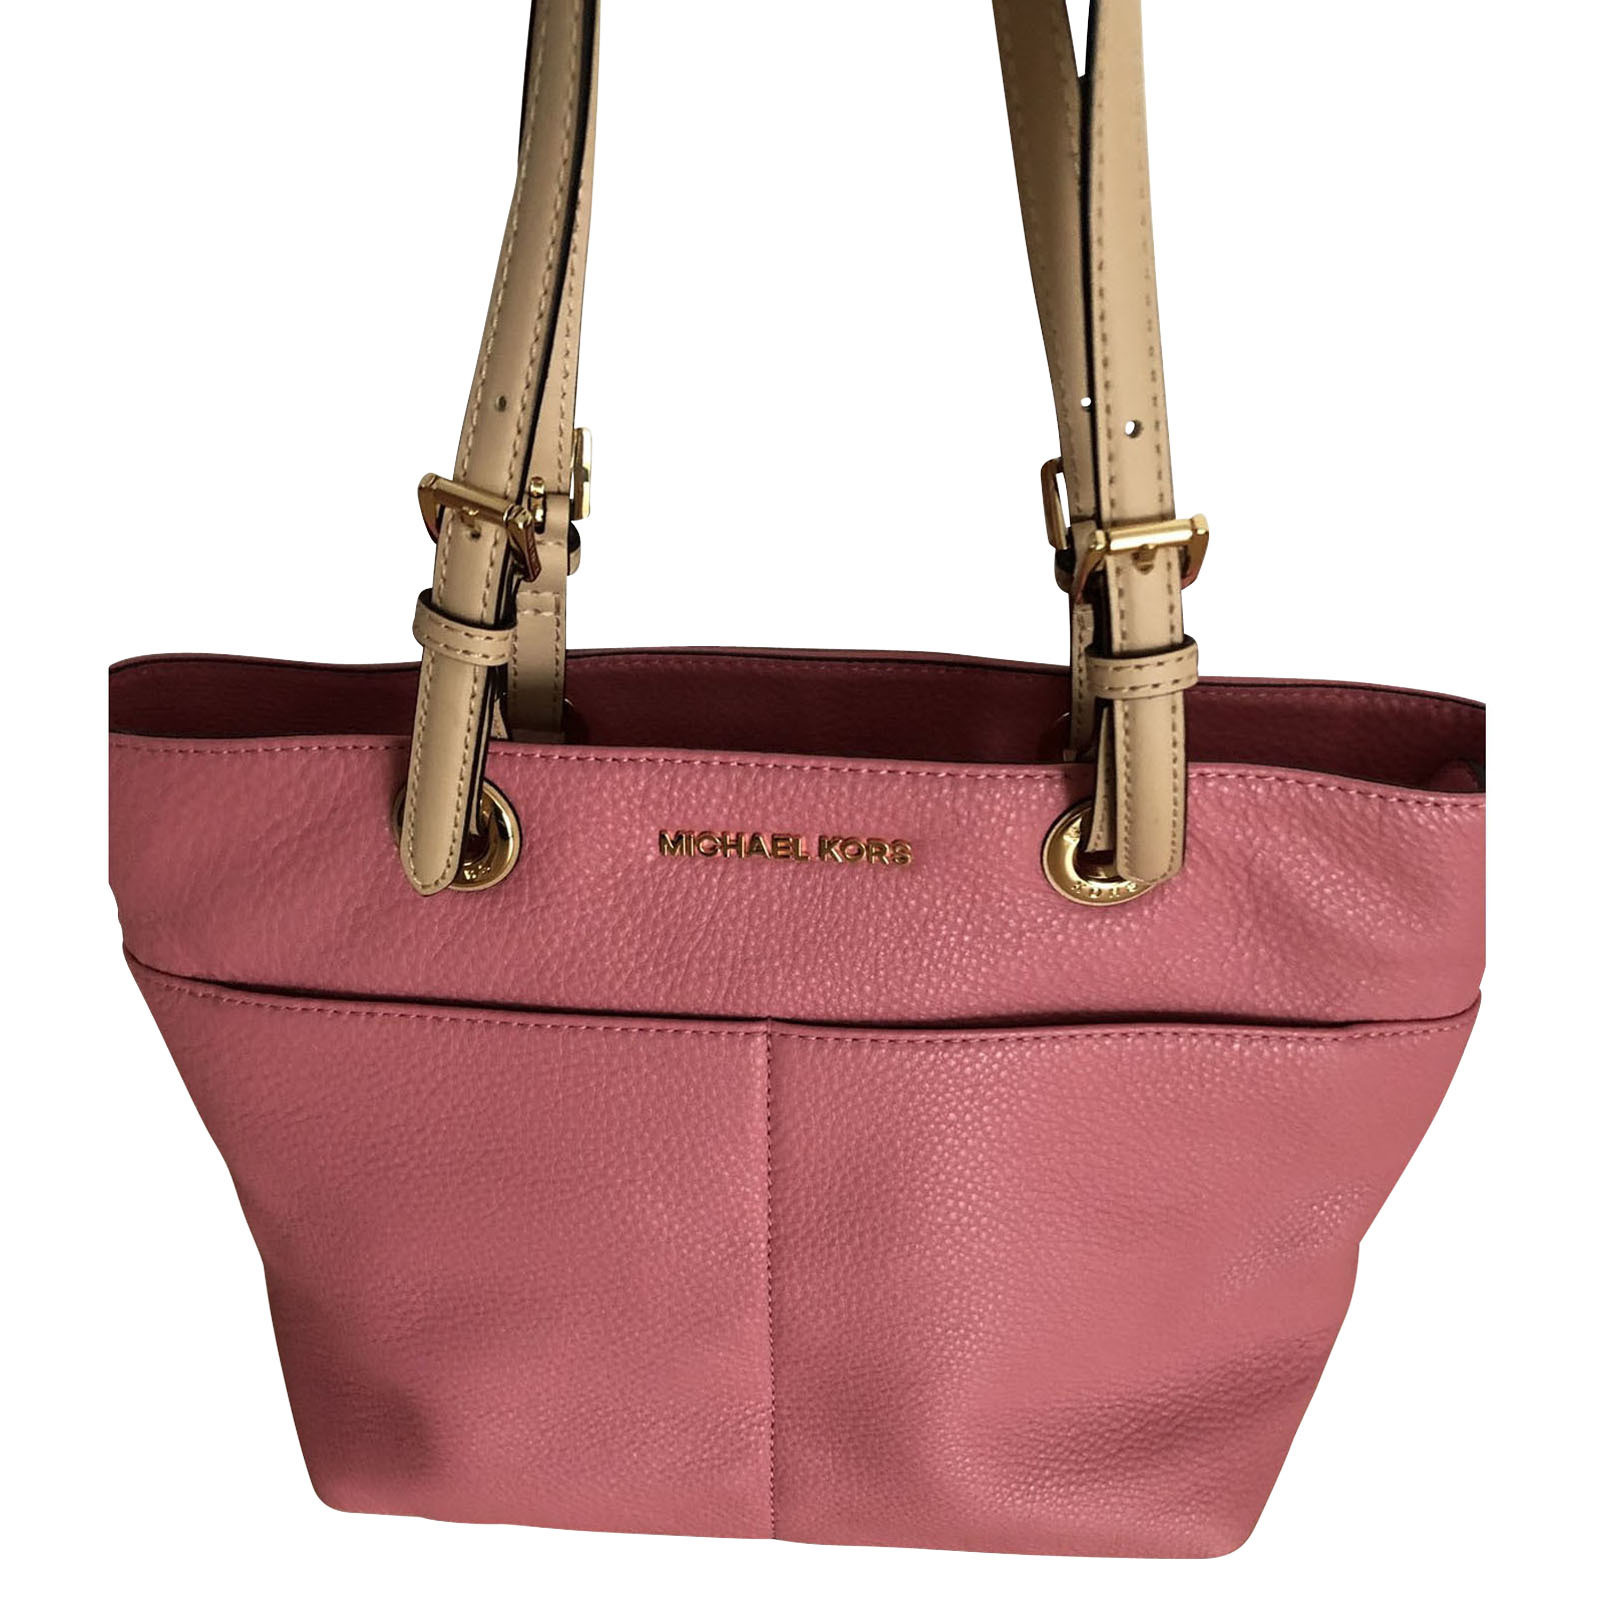 Michael Kors Handtasche aus Leder in Rosa Pink Second